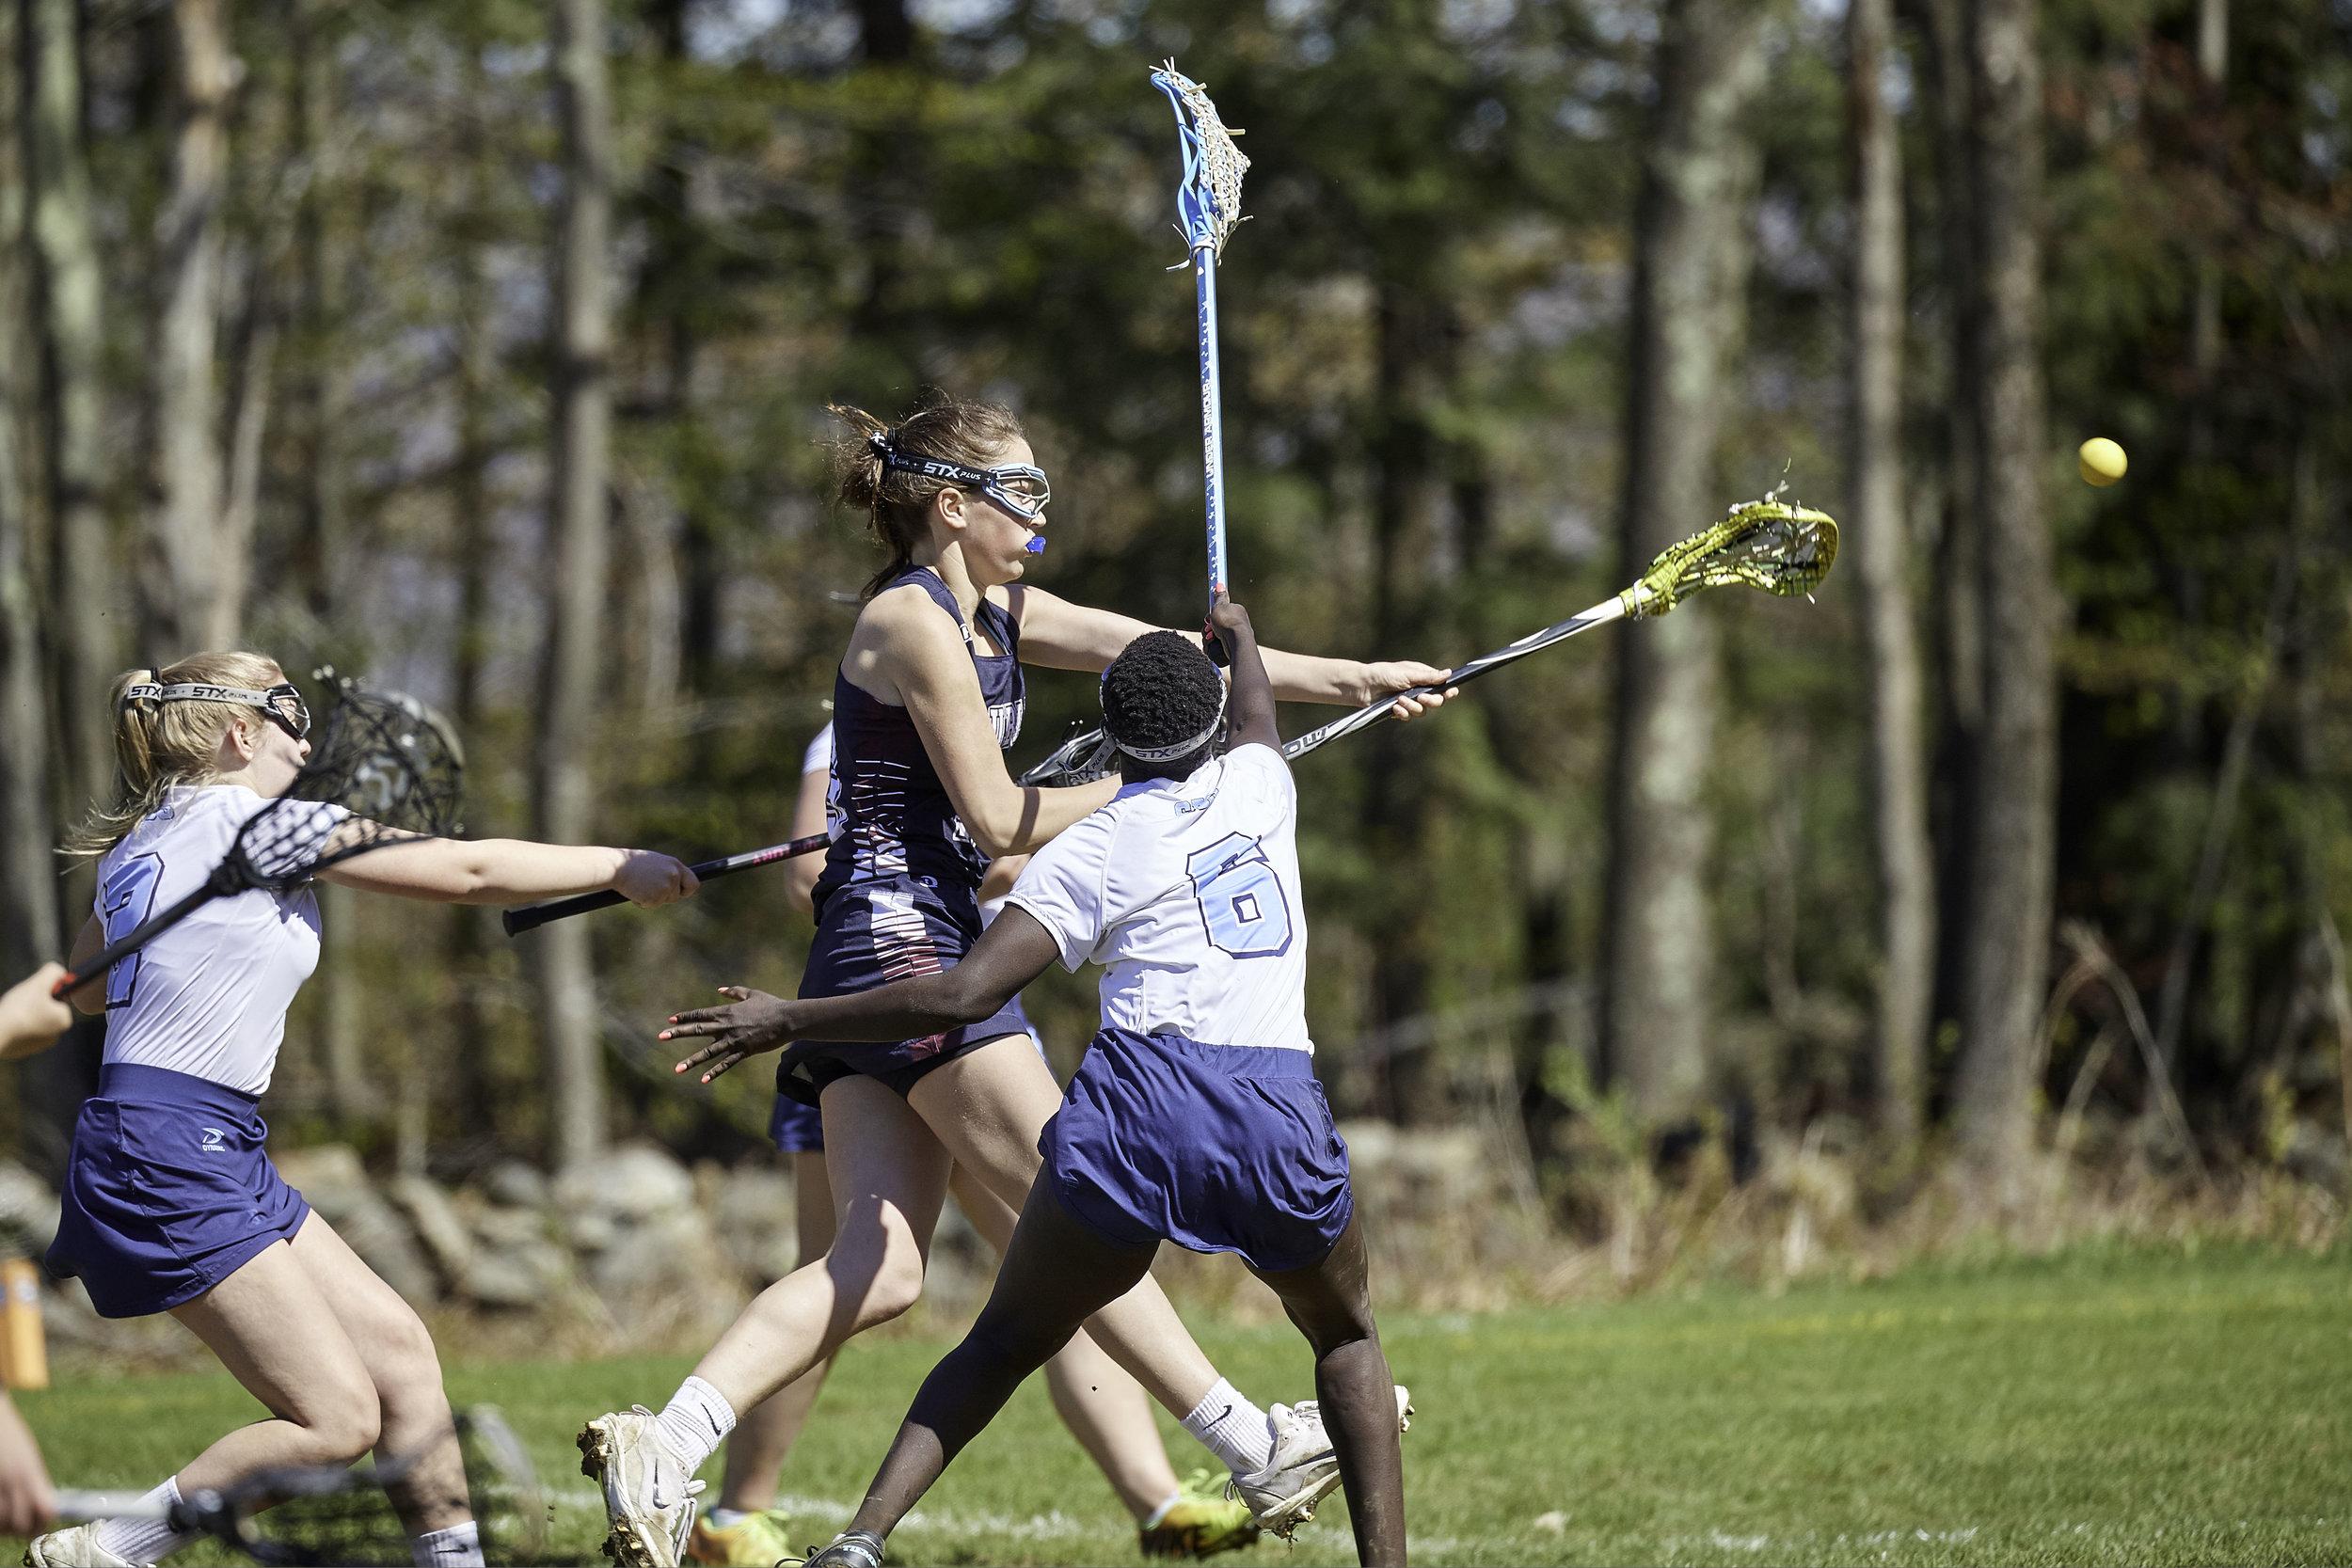 Girls Lacrosse vs. Stoneleigh Burnham School - May 11, 2019 - May 10, 2019193461.jpg